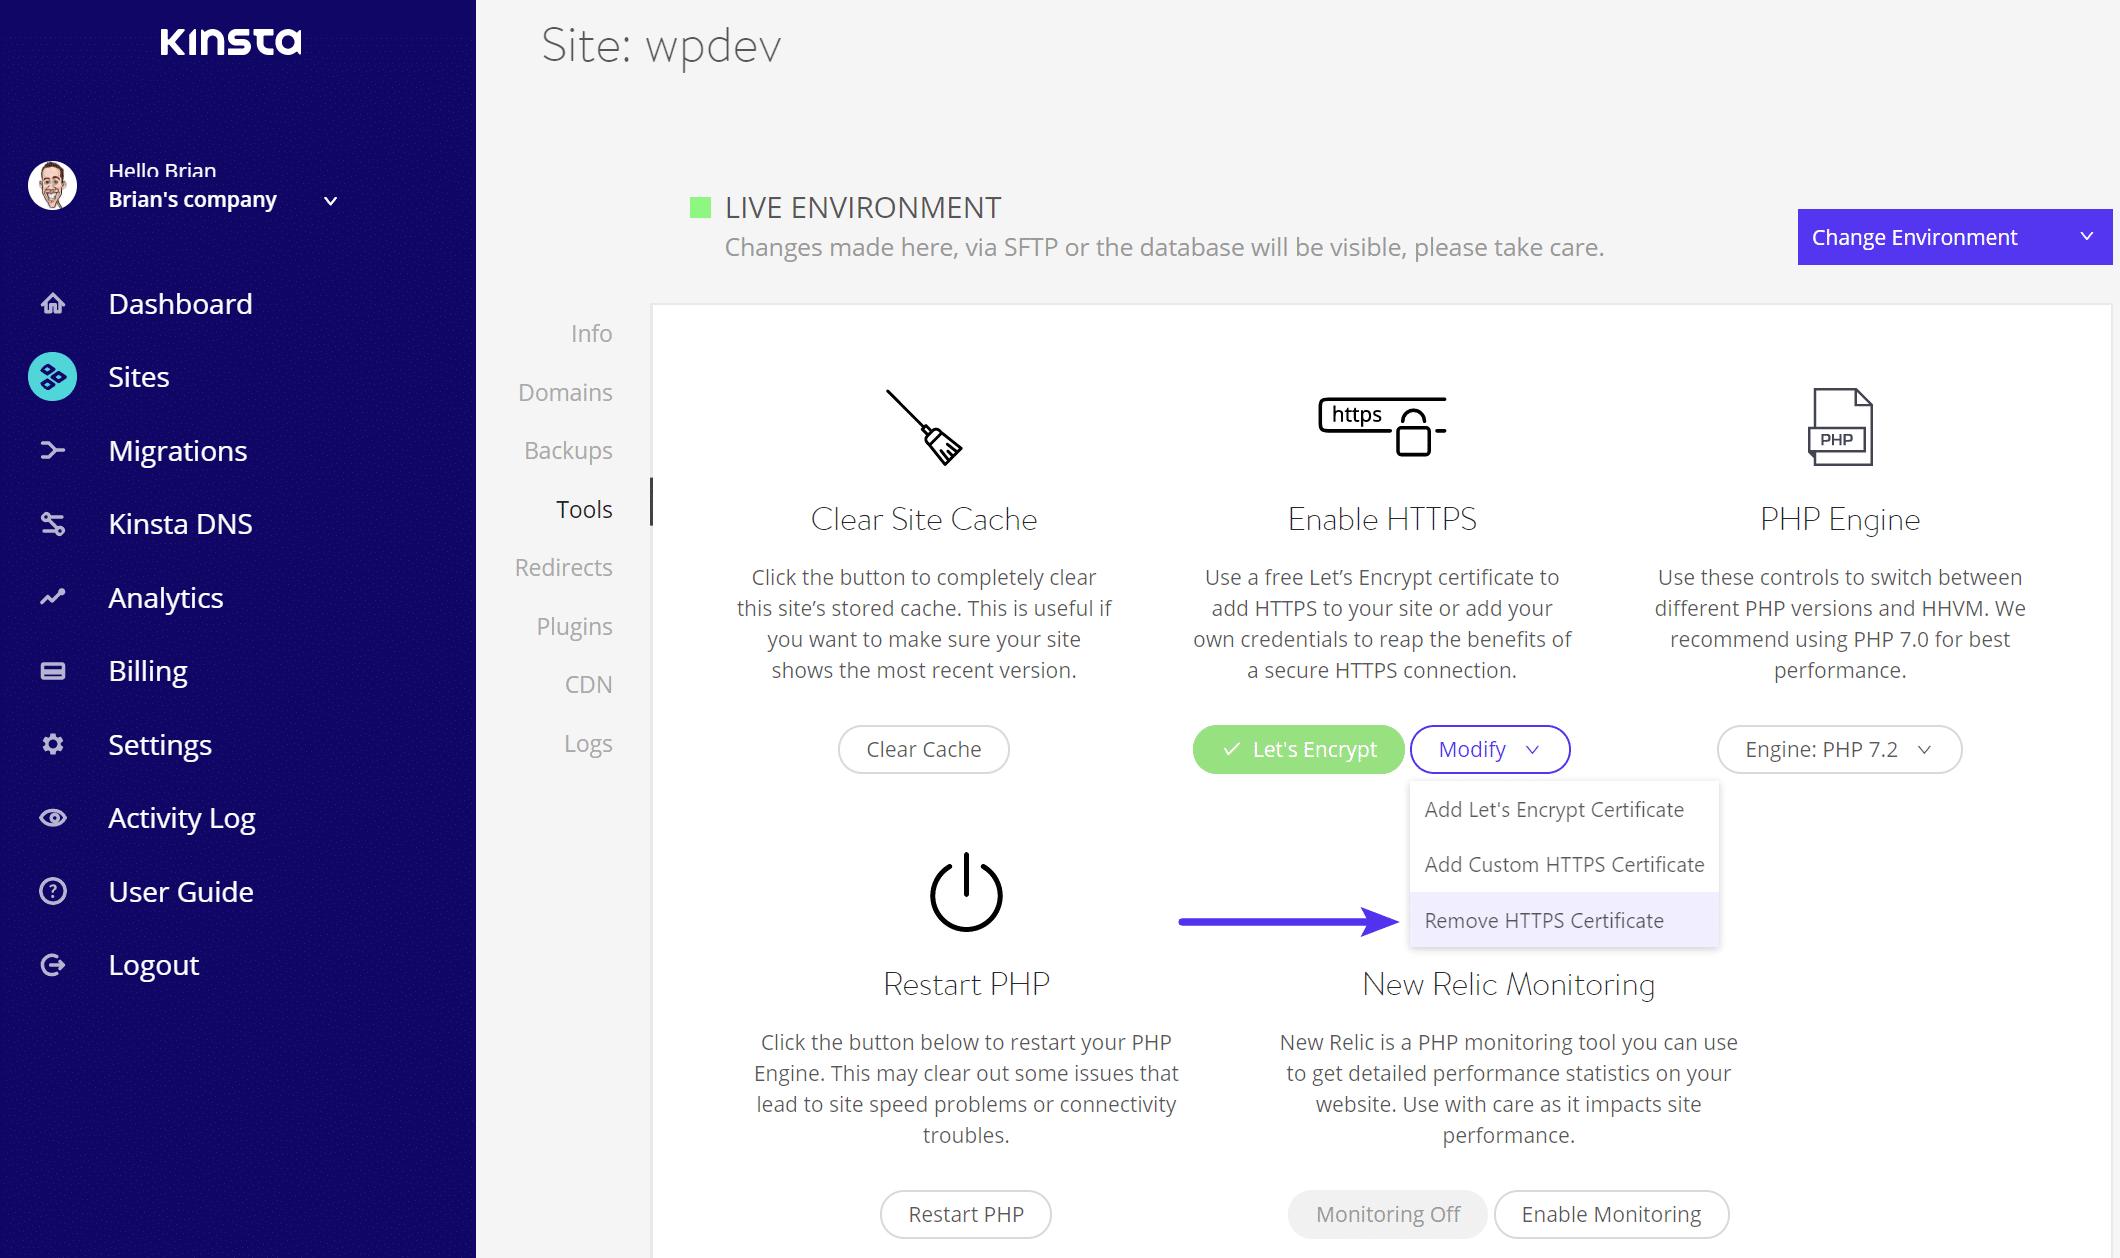 HTTPS証明書を削除する